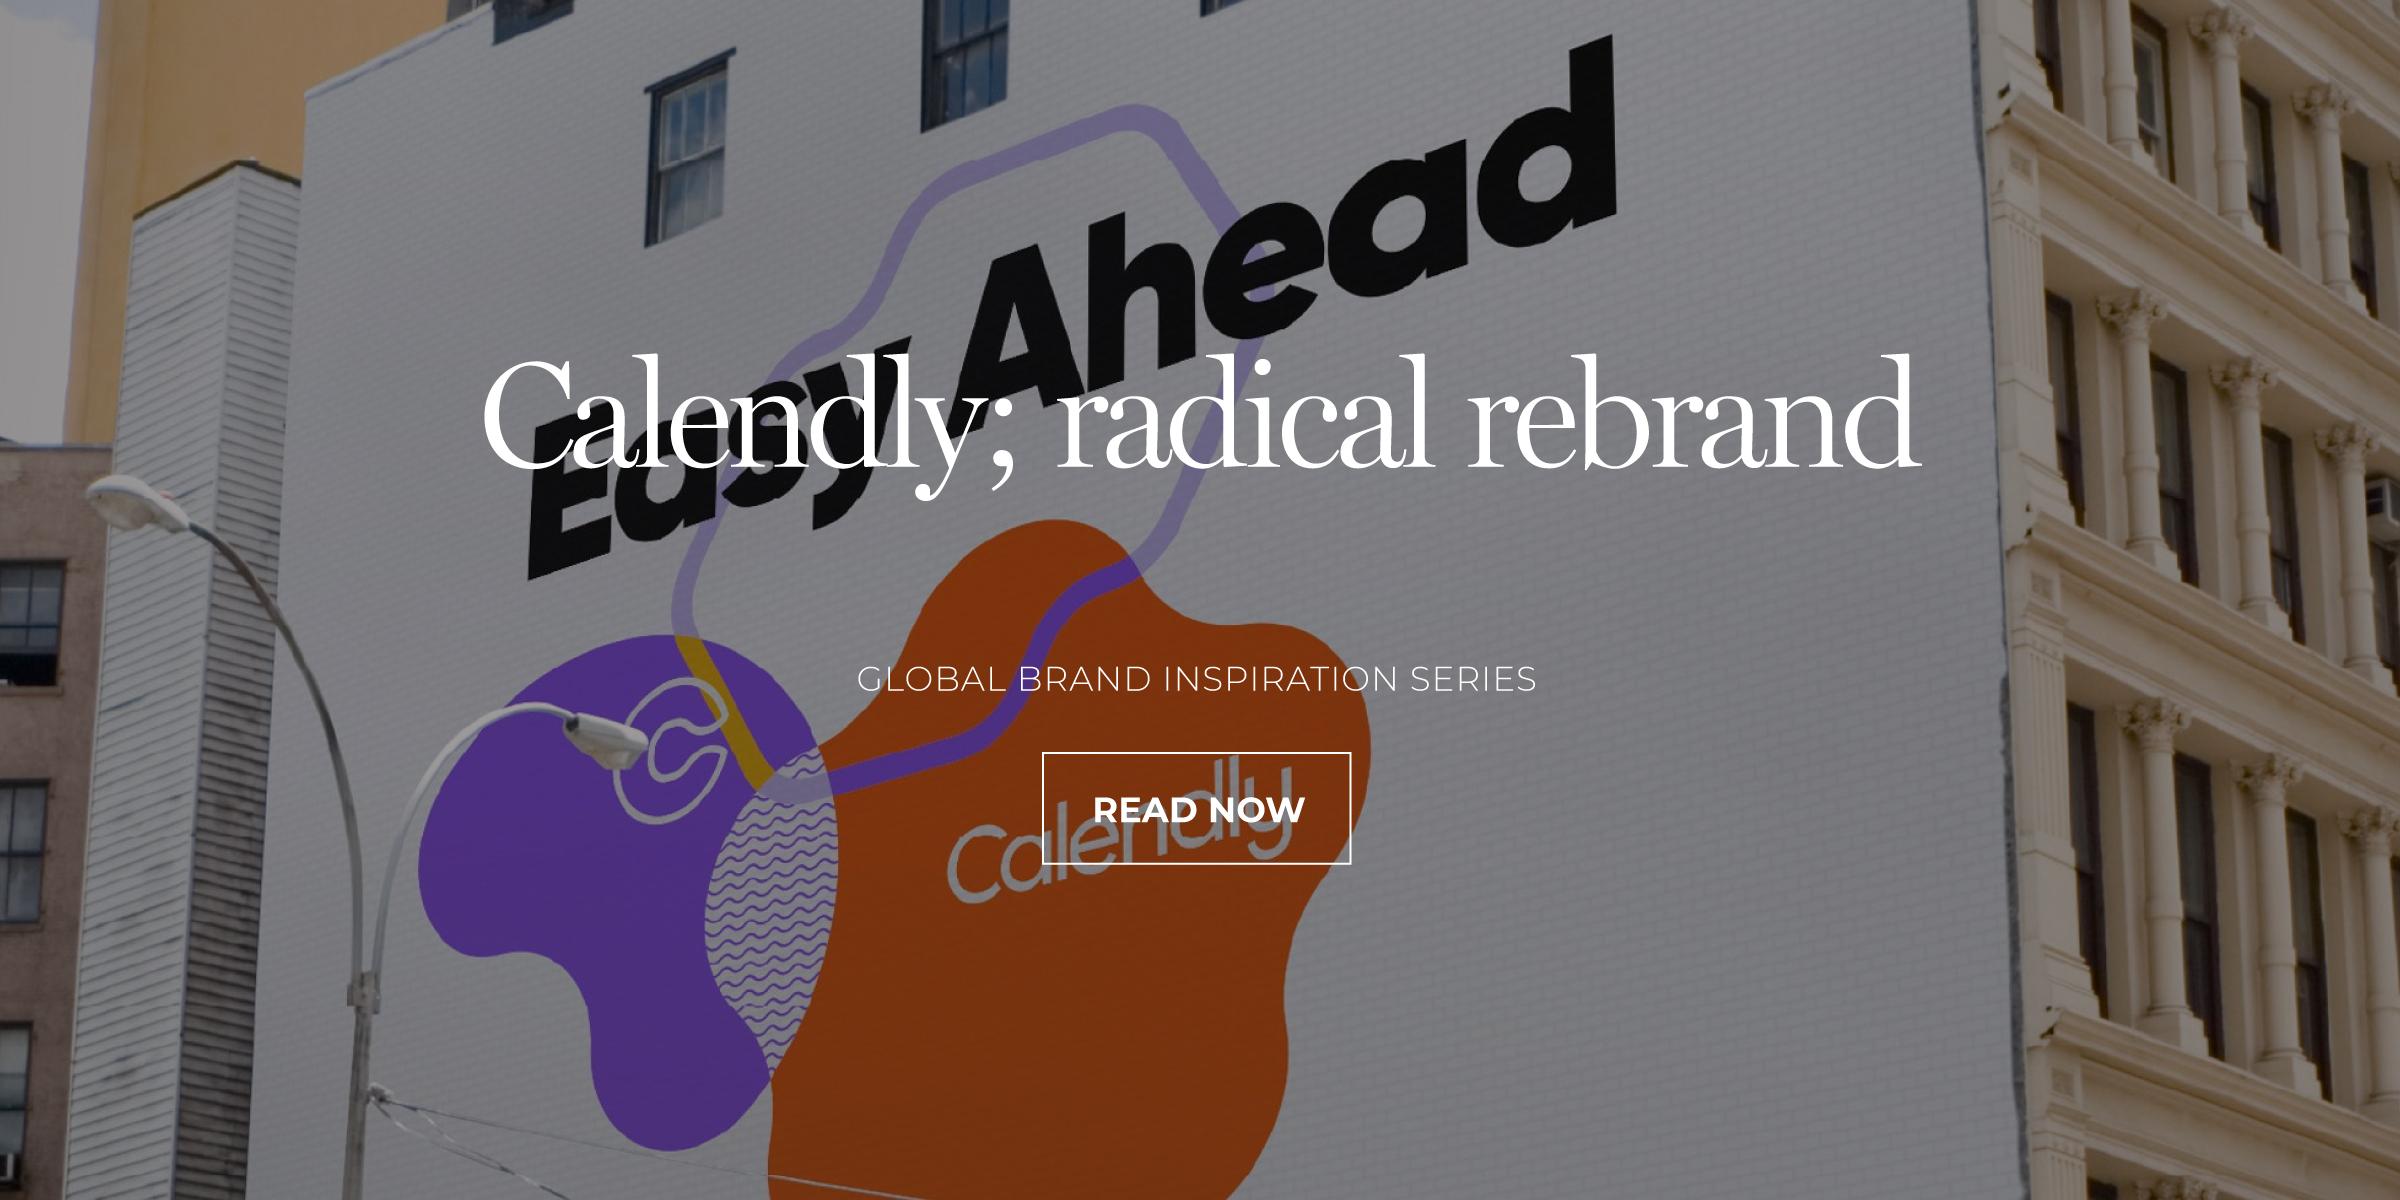 Calendly; Radical Rebrand